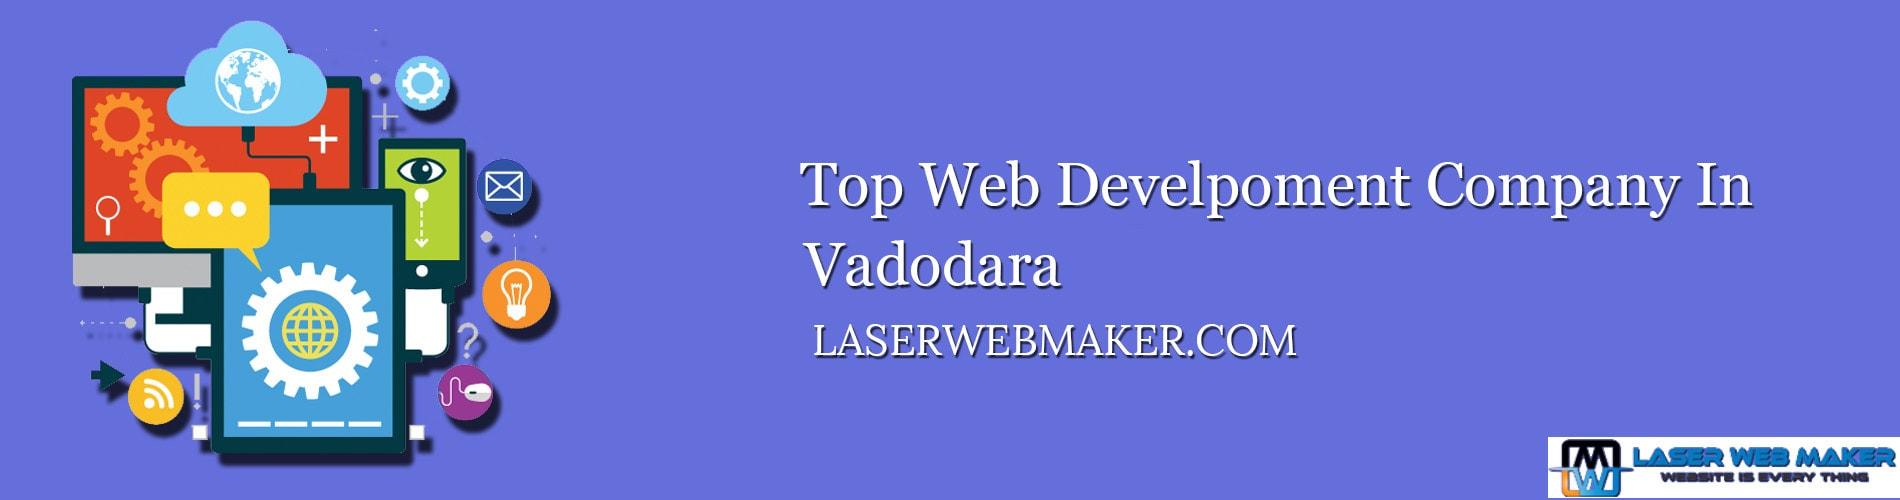 Top Web Development Company In Vadodara Gujarat